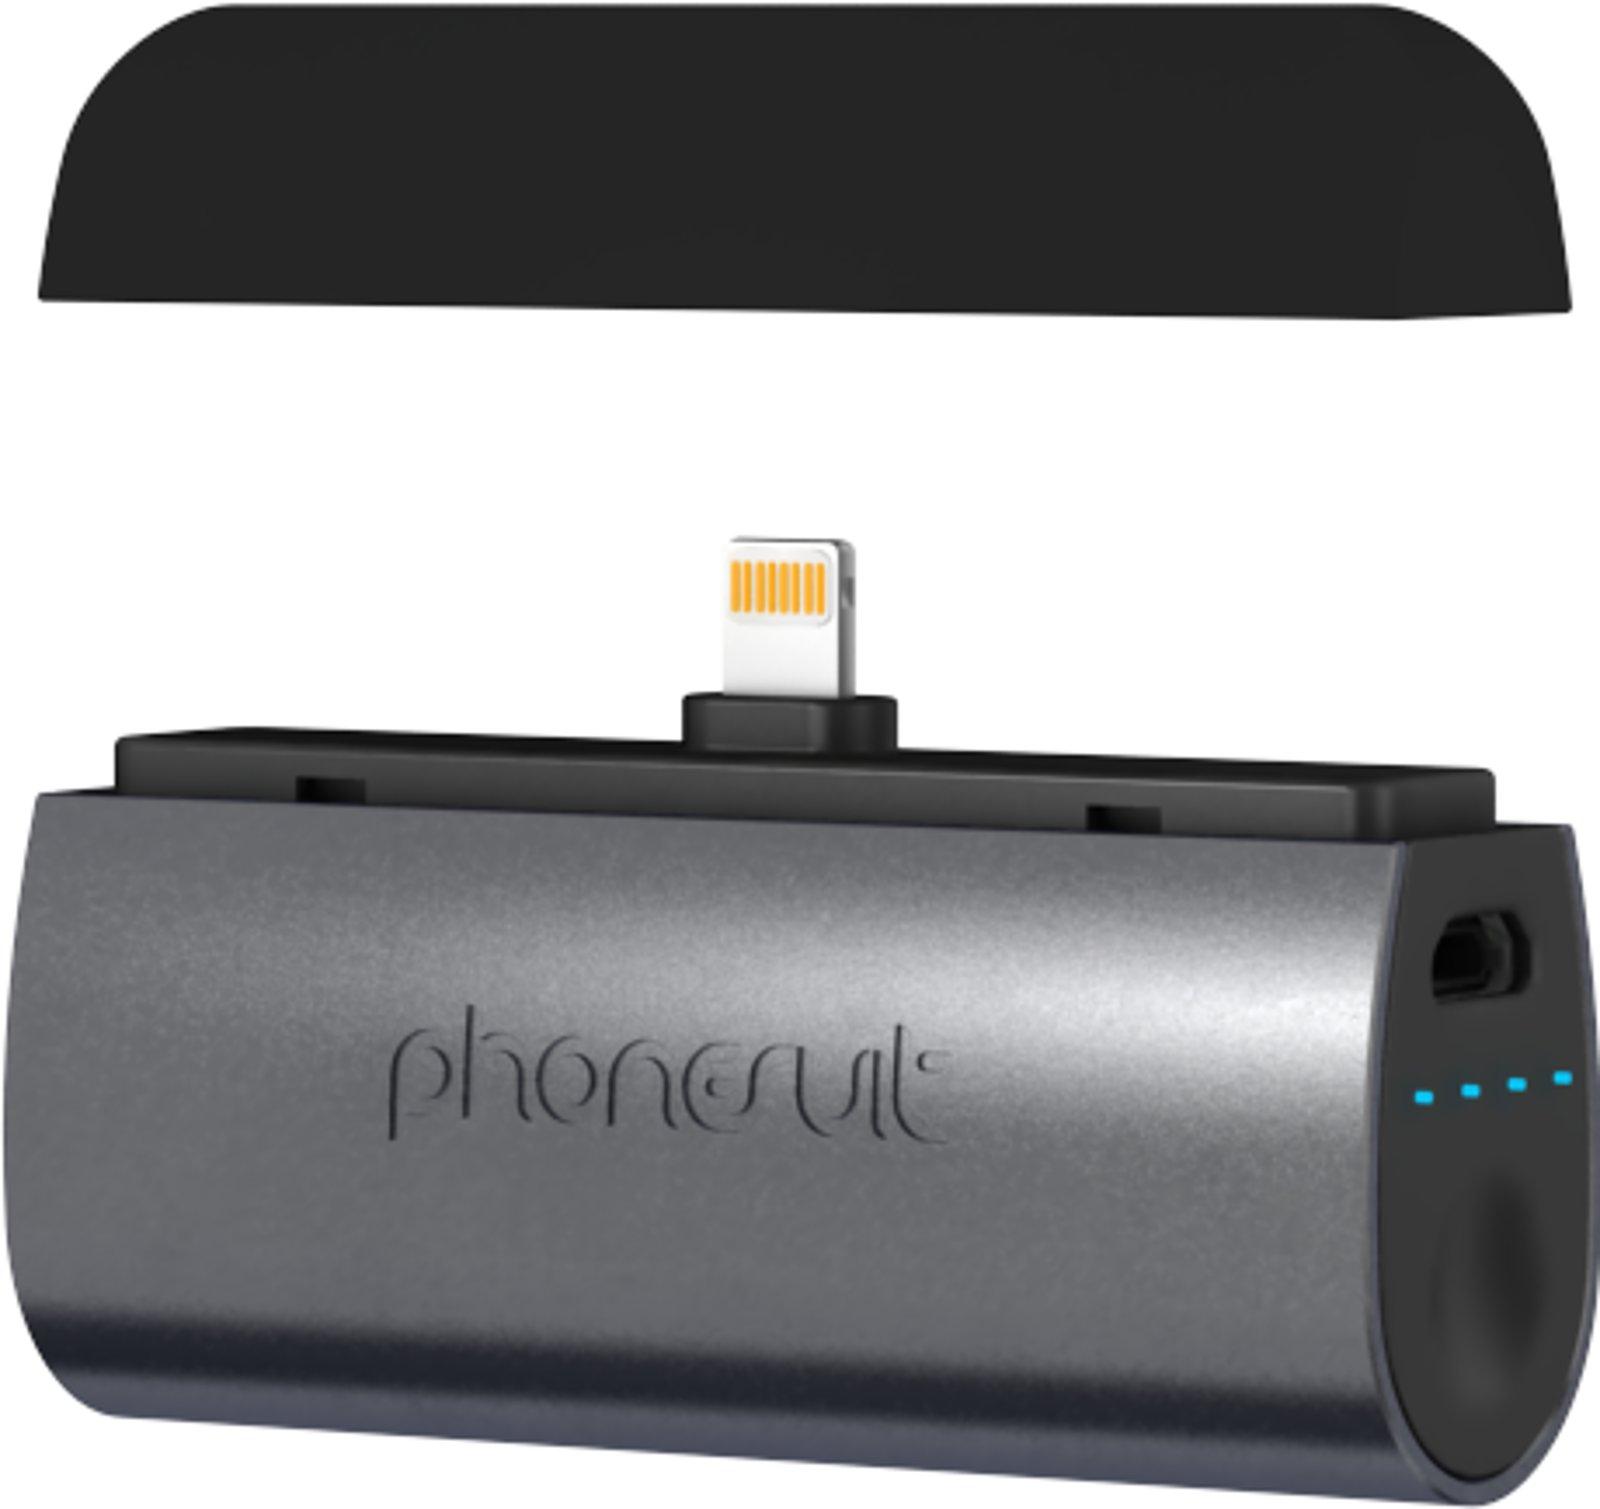 PhoneSuit Flex XT Pocket Charger for iPhone